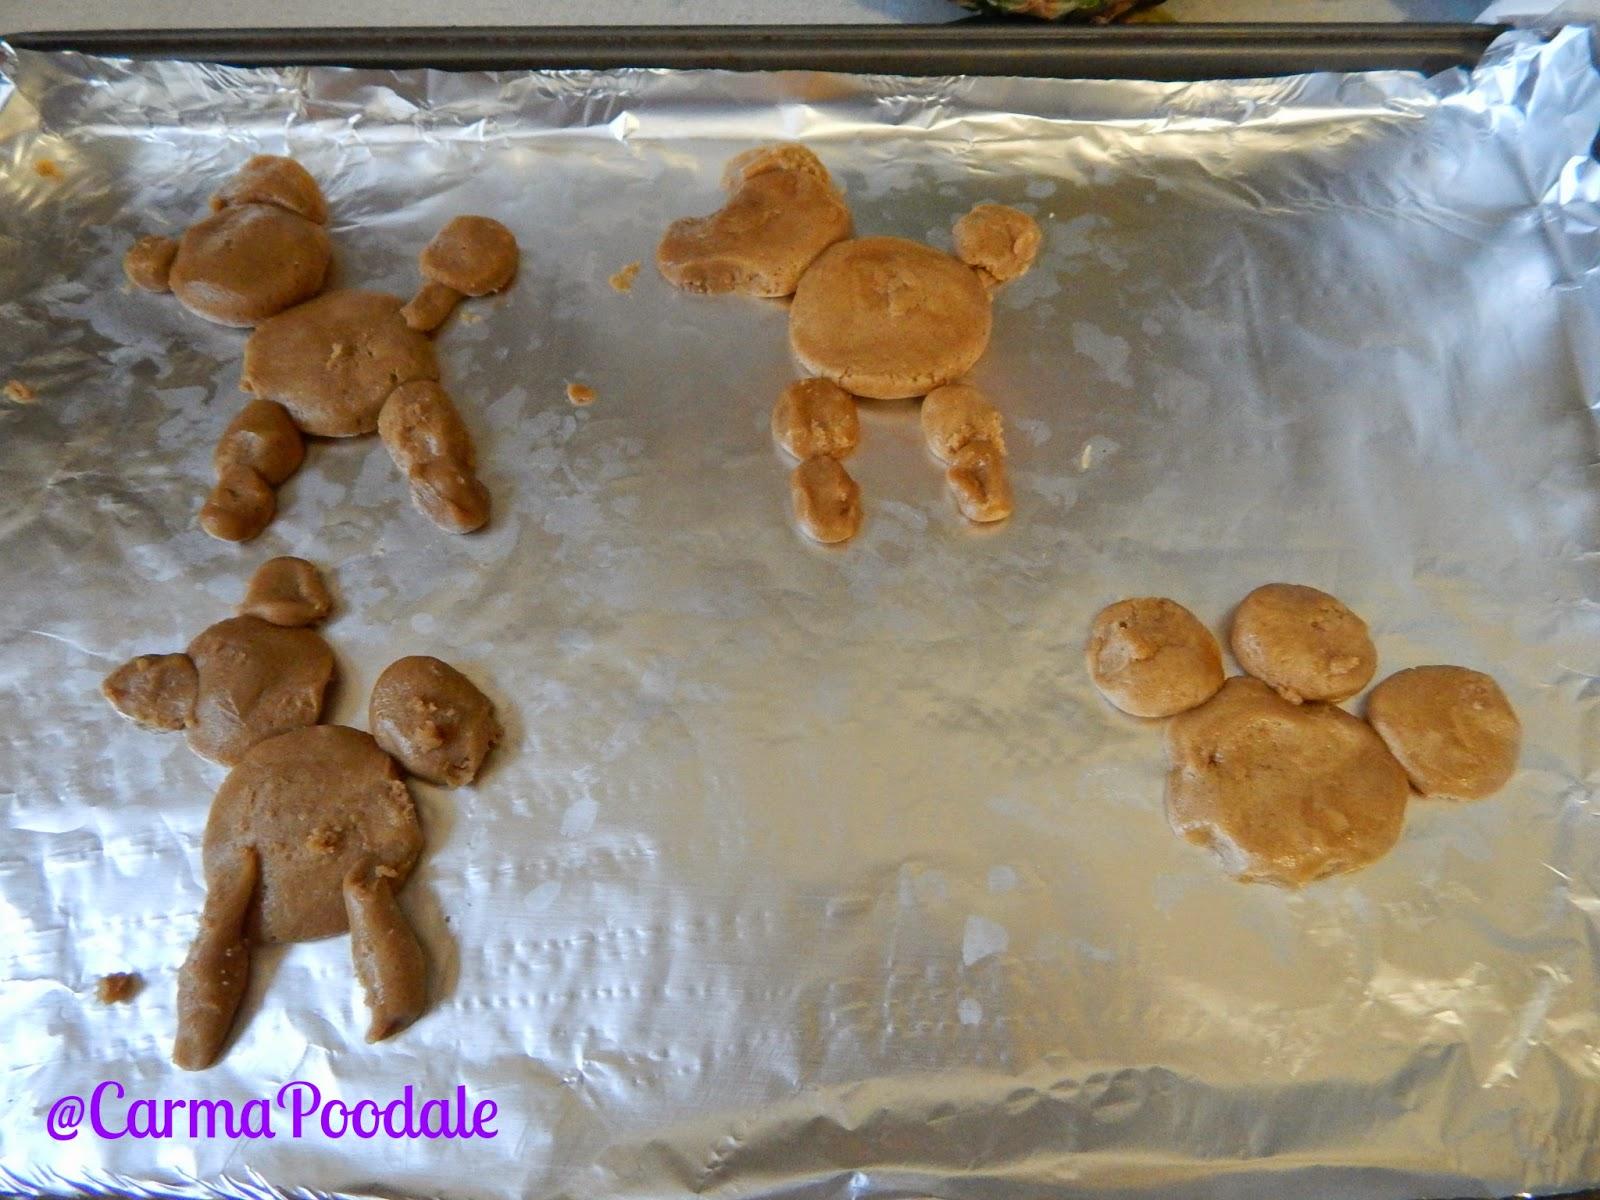 cookie shaped like poodles